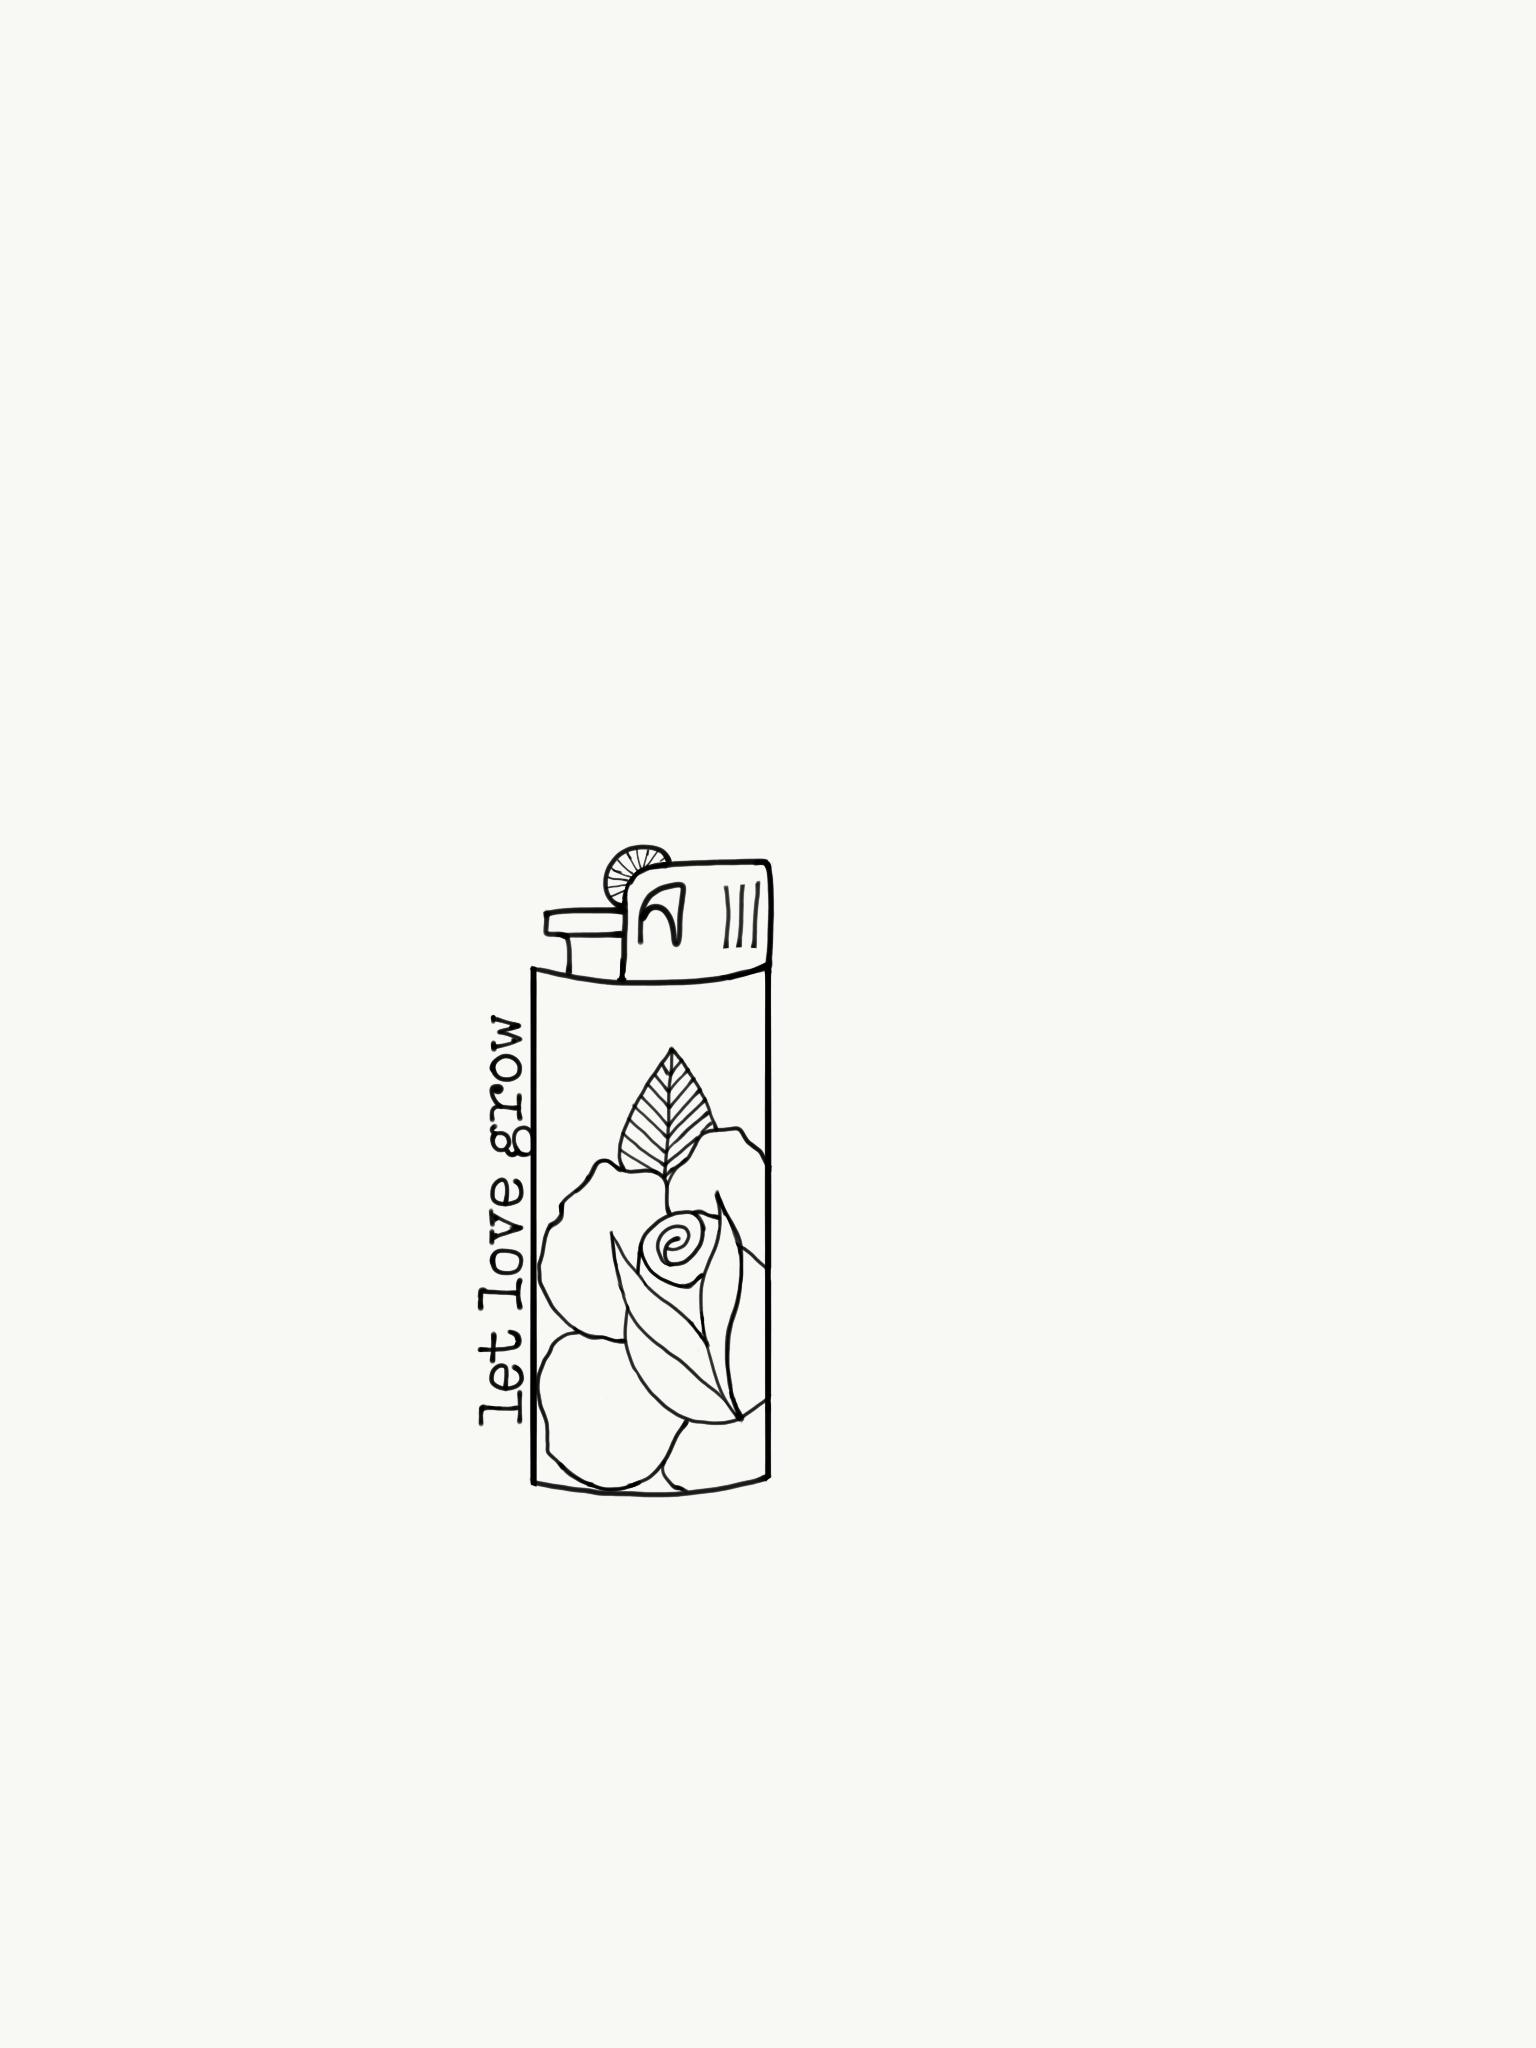 Mit Adobe Photoshop Sketch Erstellt Erhaltlich Unter Http Apple Co 1ffmnsi Mini Drawings Sketch Book Cute Simple Wallpapers